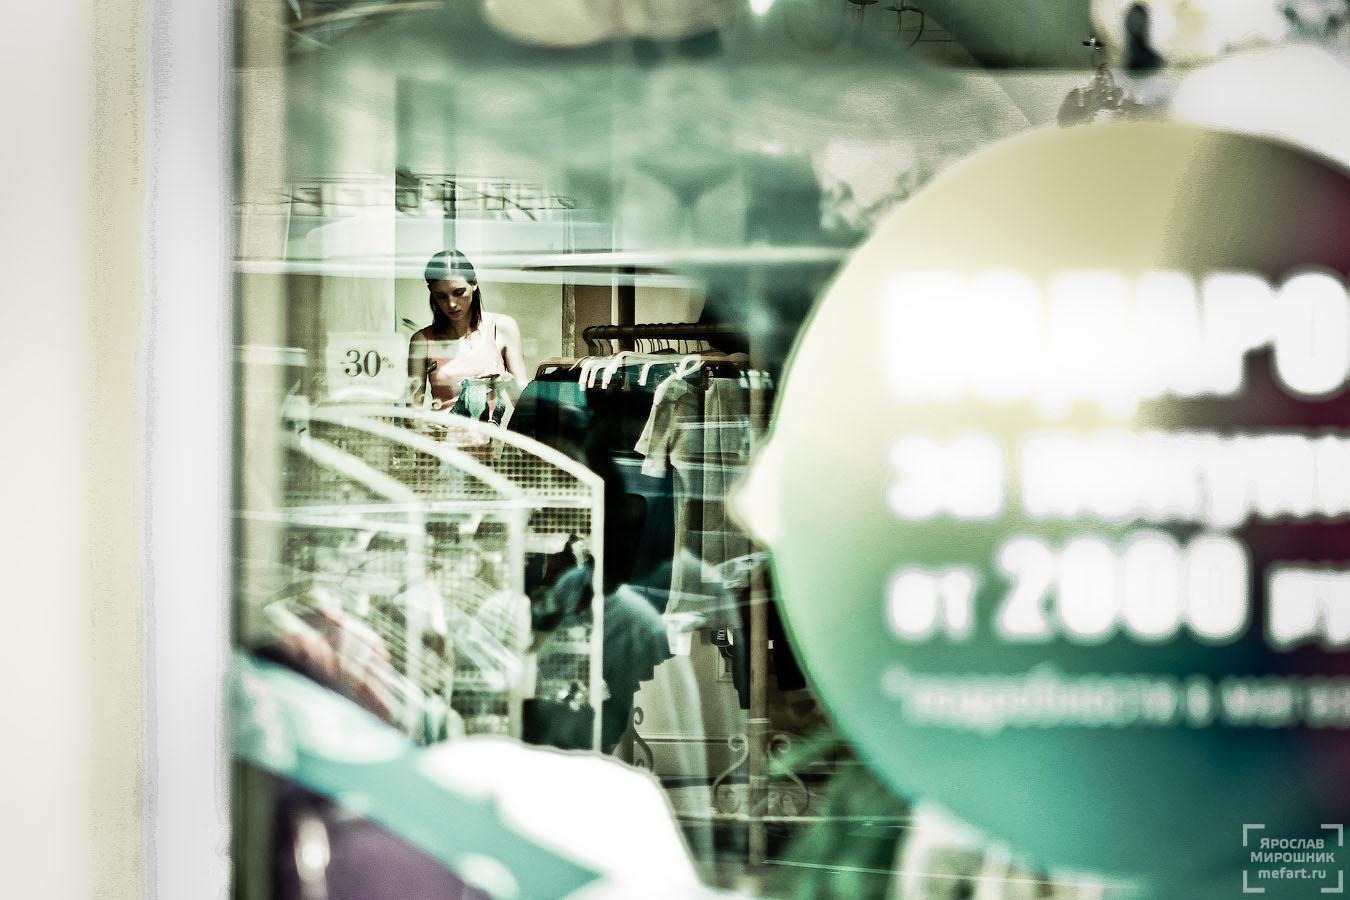 продавщица в магазине фото